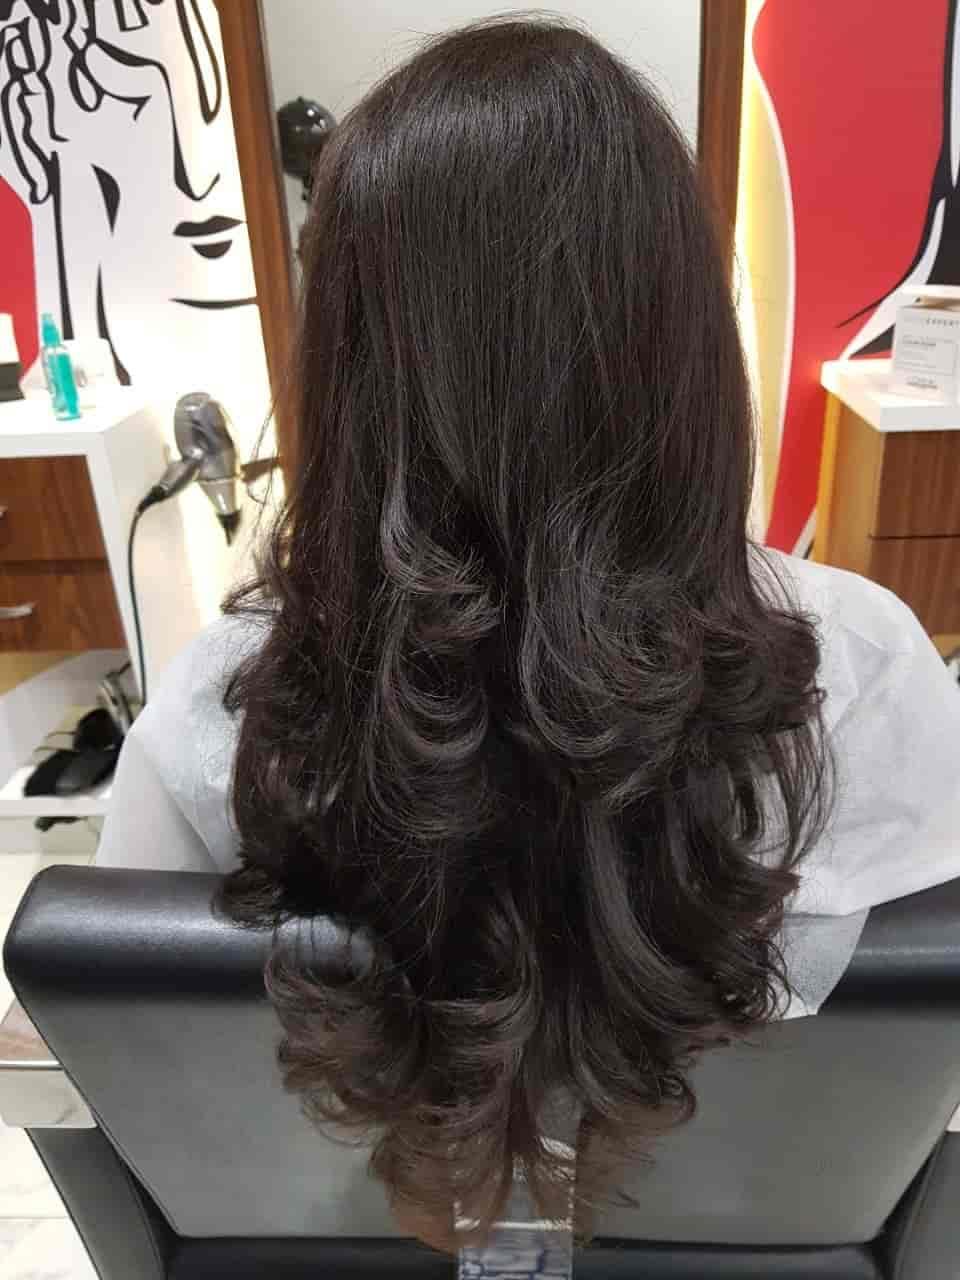 Jawed Habib Hairxpreso Unisex Salon Thakur Village Kandivali East Beauty Spas In Mumbai Justdial